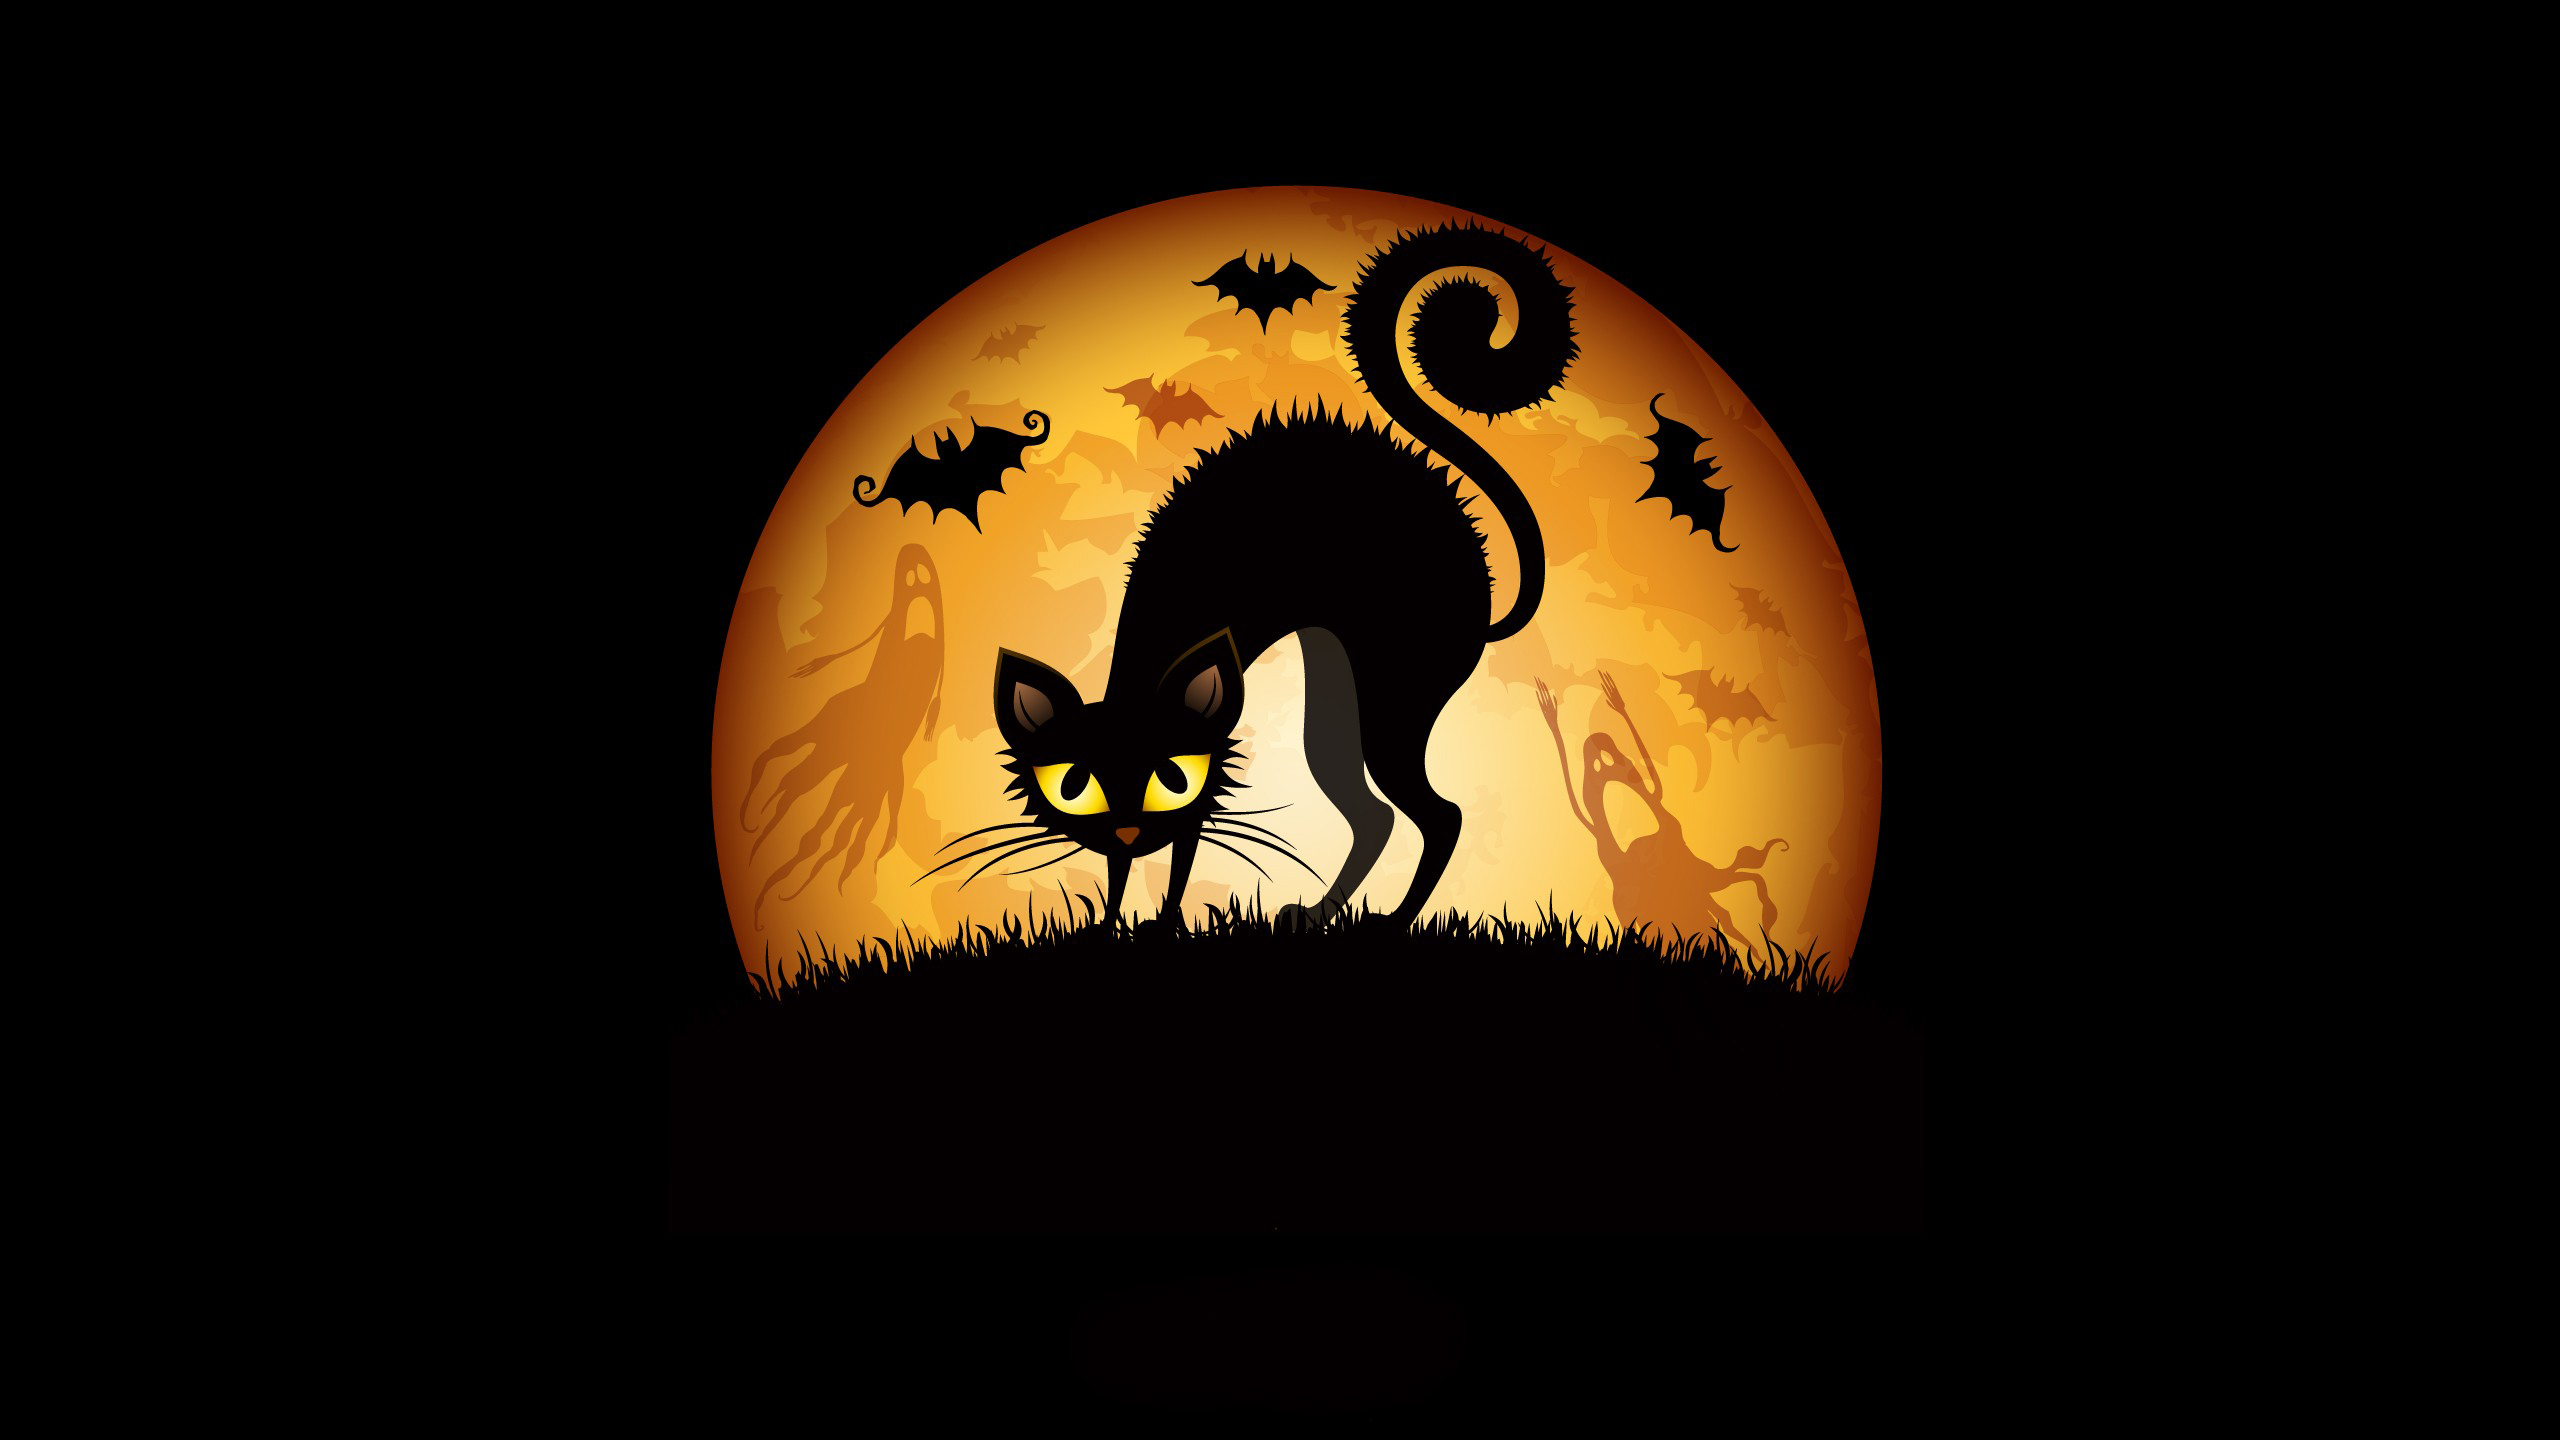 Fondos Android Halloween 2013 (5)